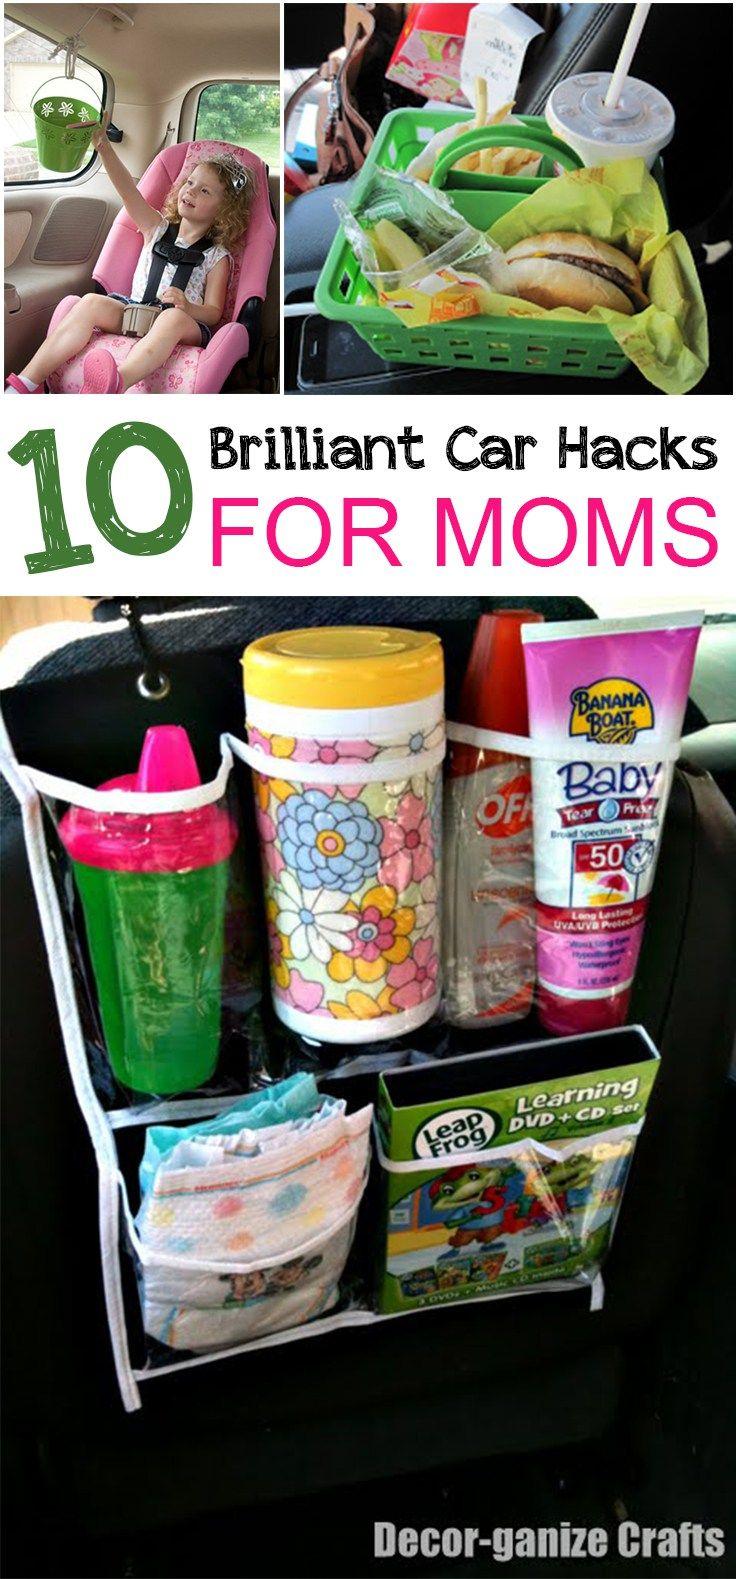 10 Brilliant Car Hacks for Moms